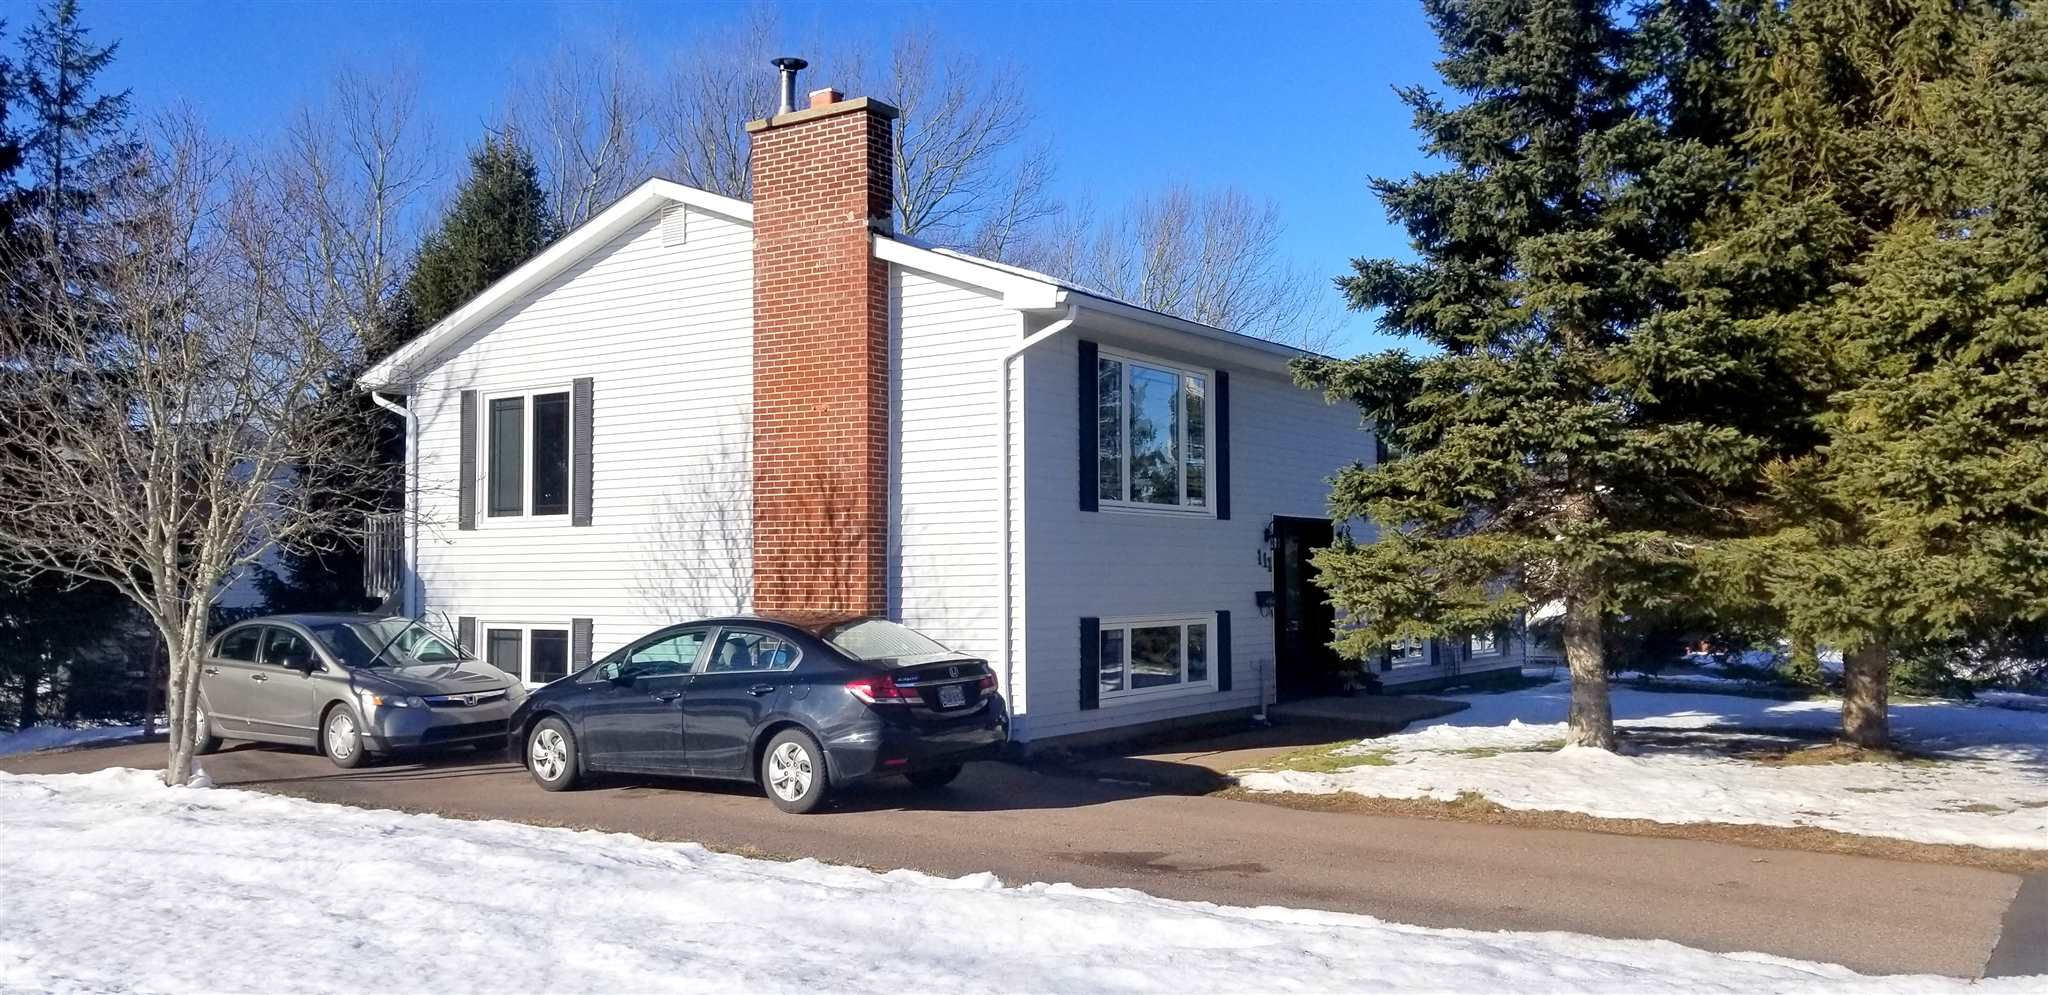 Main Photo: 111 Willow Street in Amherst: 101-Amherst,Brookdale,Warren Residential for sale (Northern Region)  : MLS®# 202100837